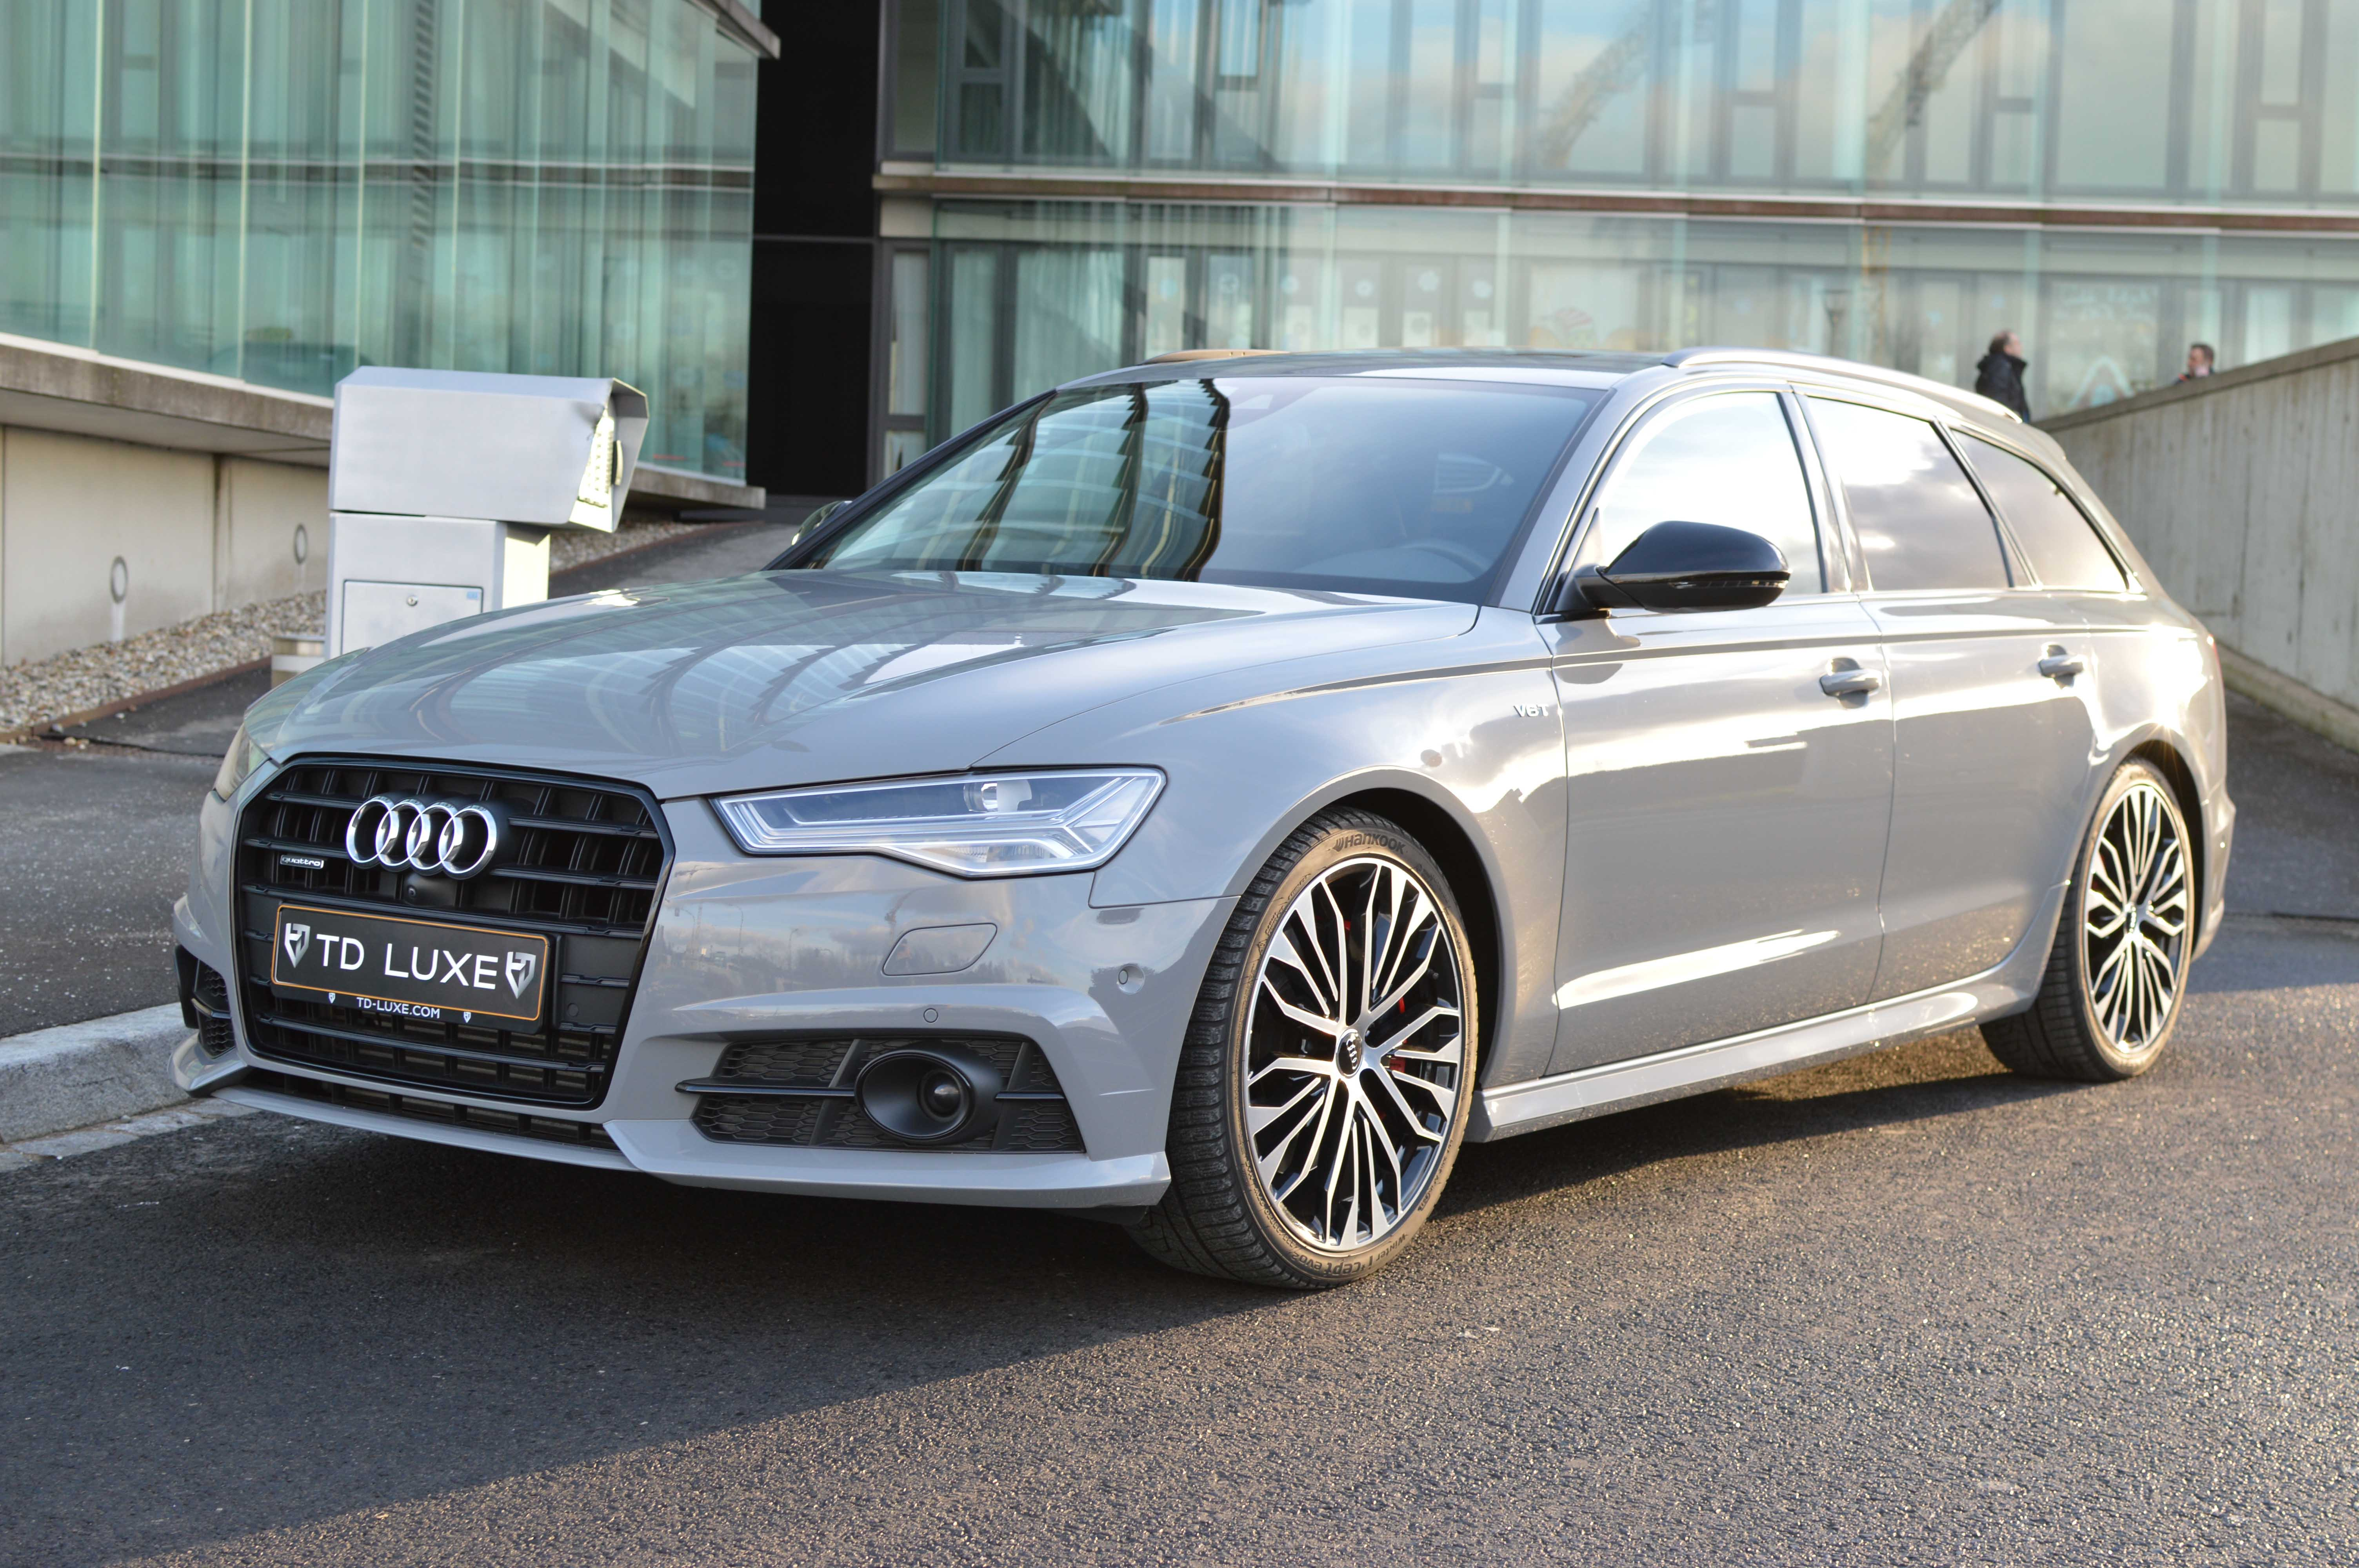 Kekurangan Audi 6 Spesifikasi